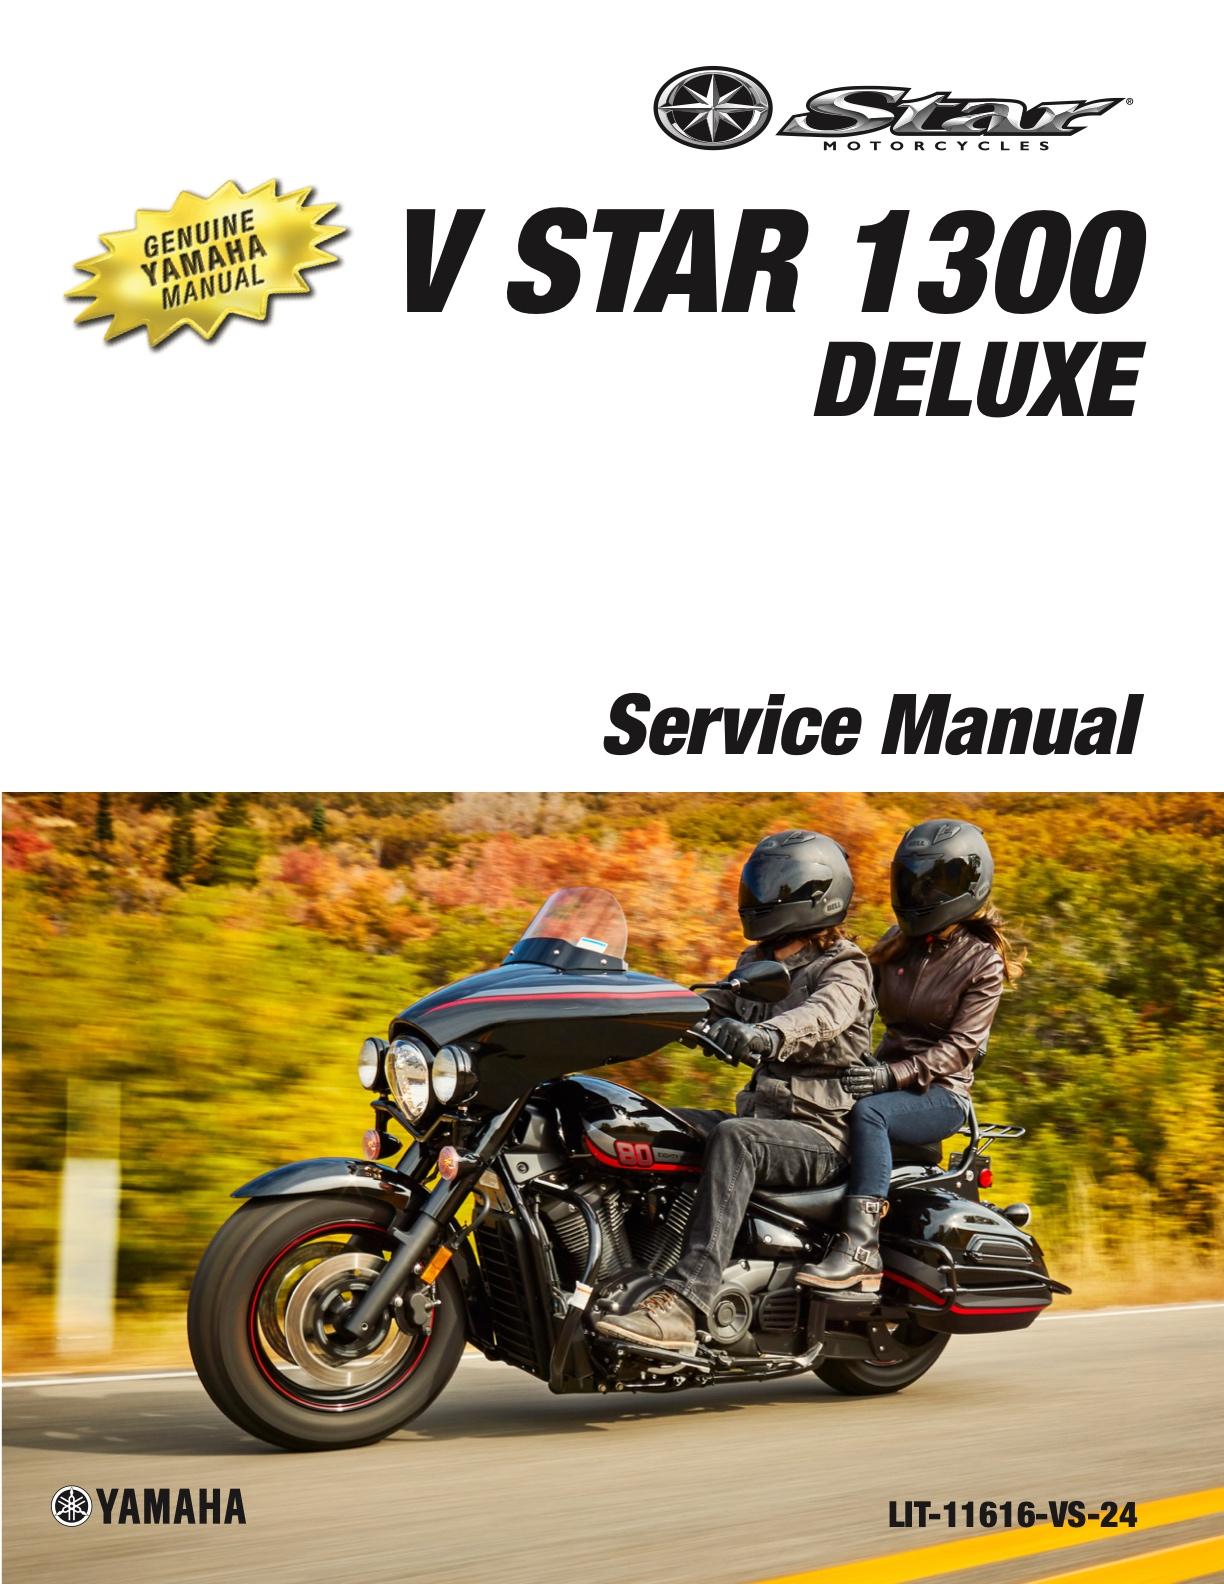 Yamaha V Star 1300 Deluxe 2013 2017 Workshop Repair Service Manual